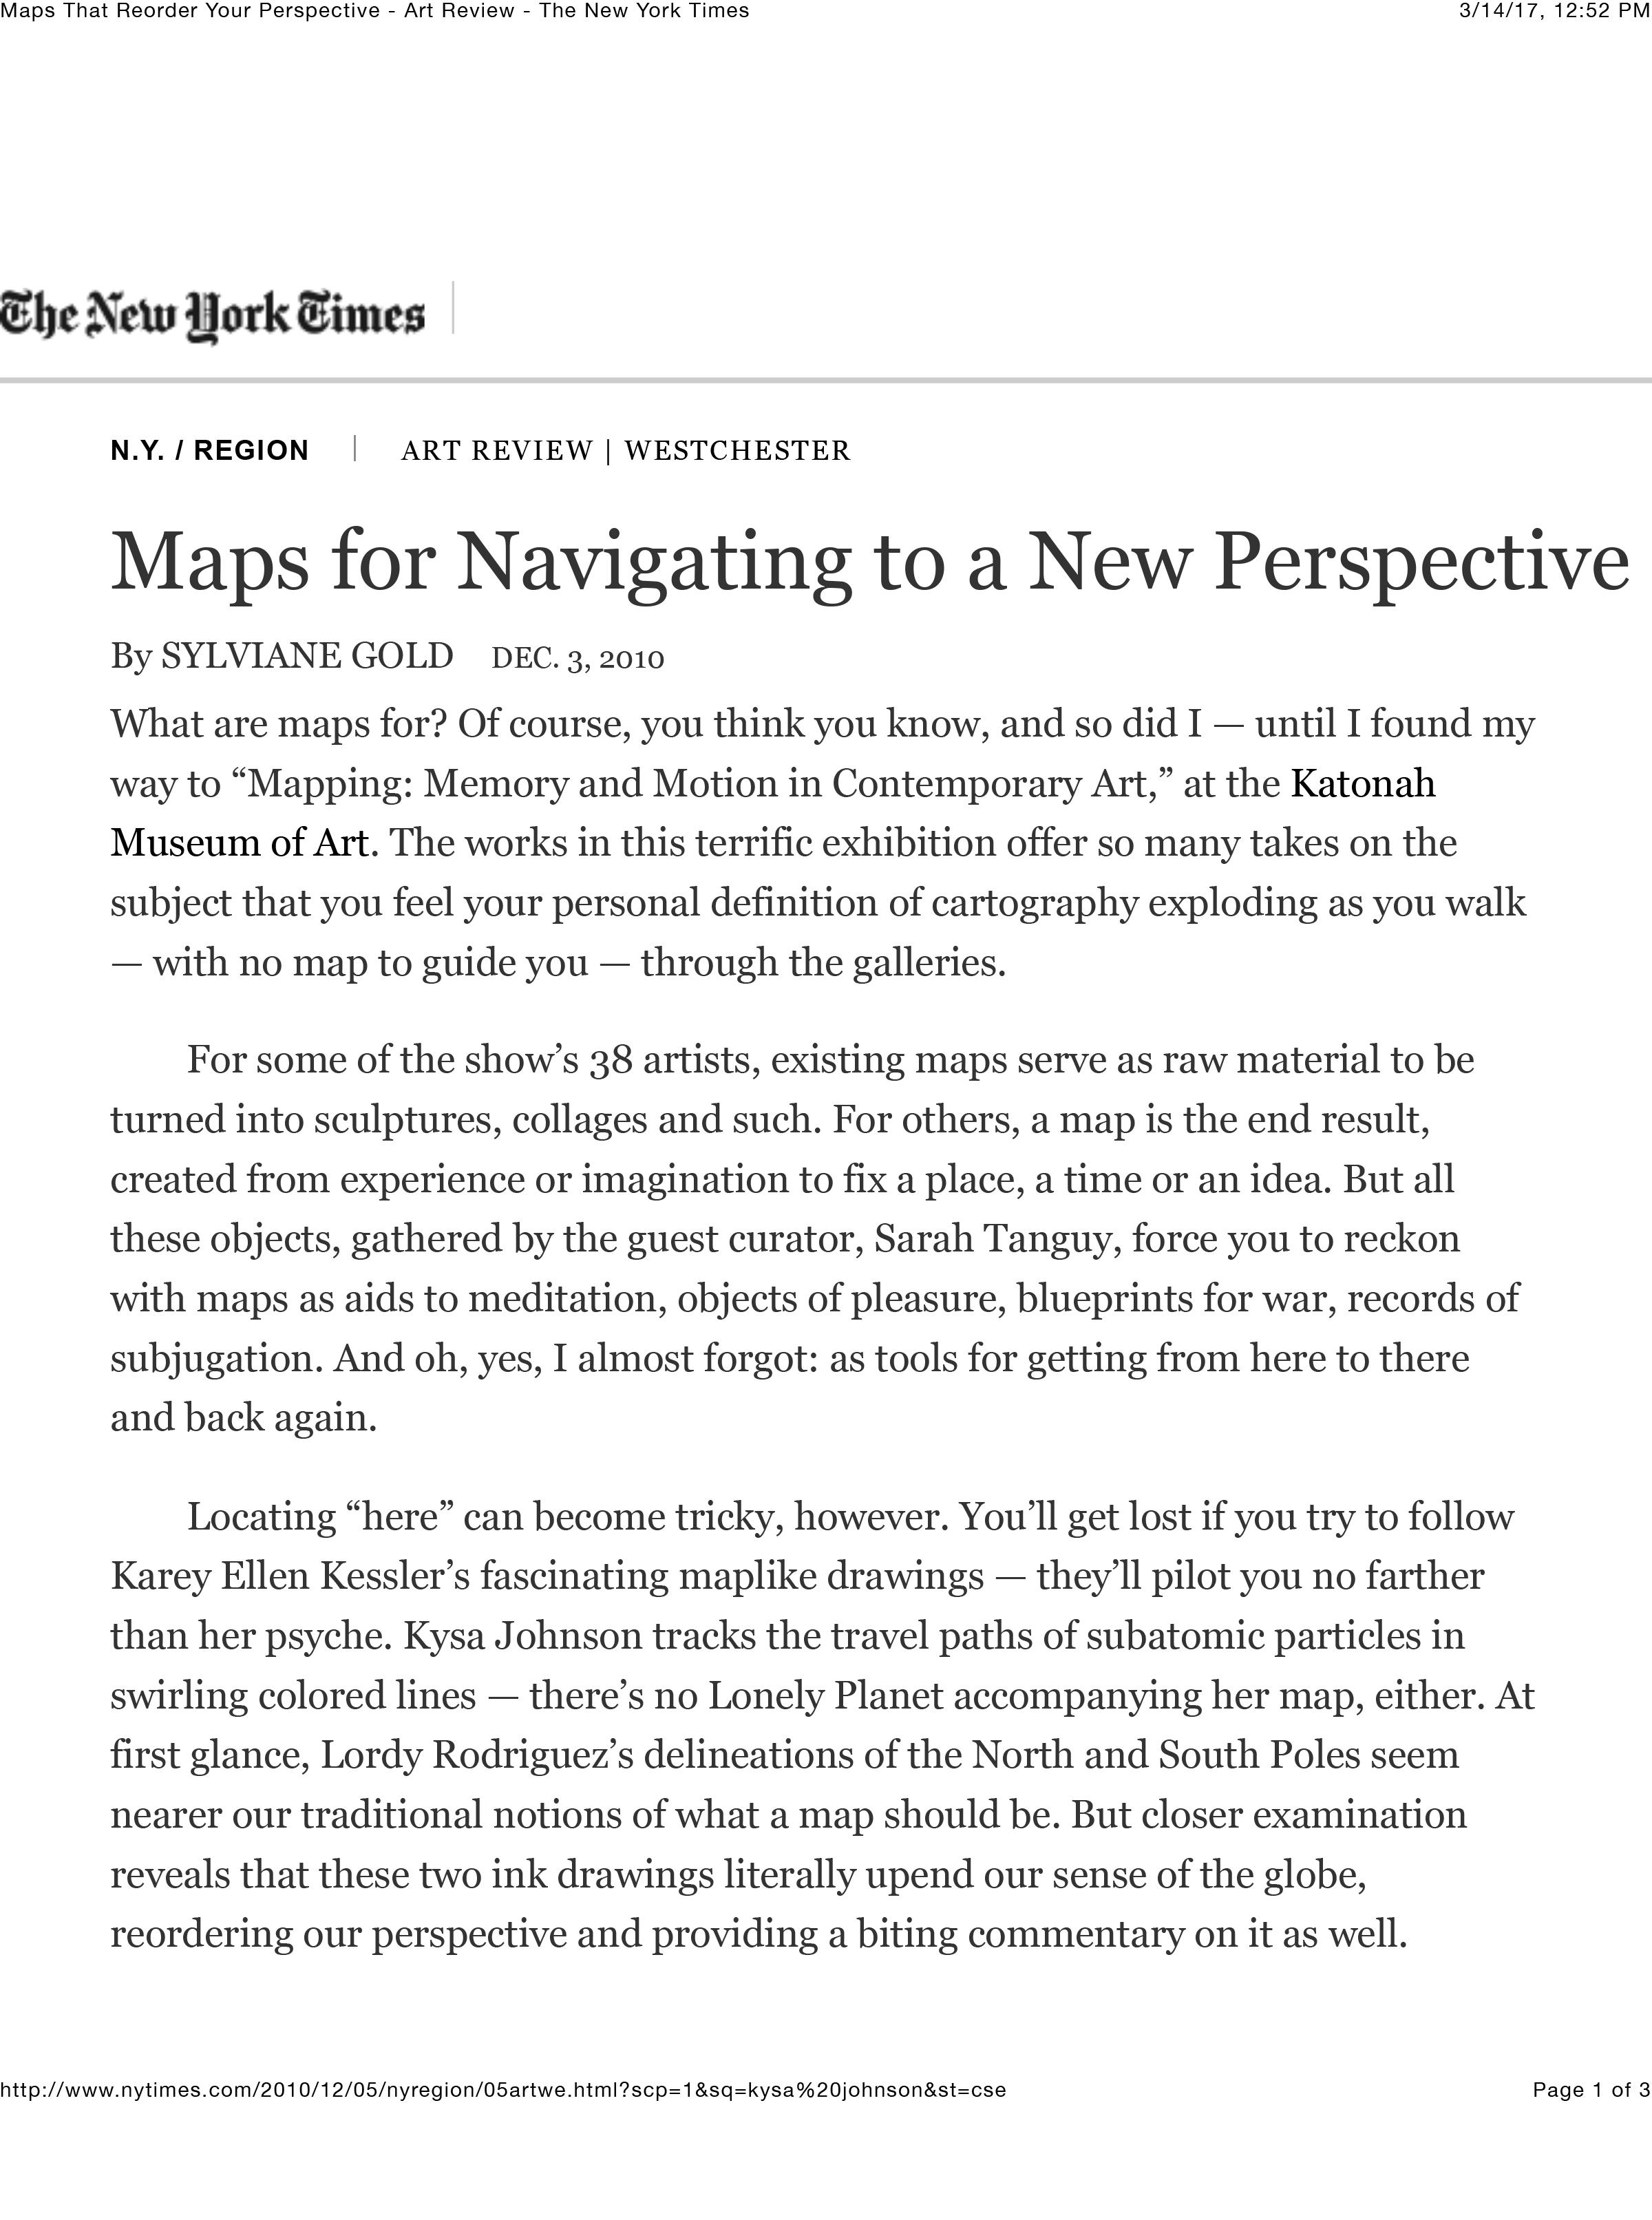 New York Times - Maps Katonah Musuem